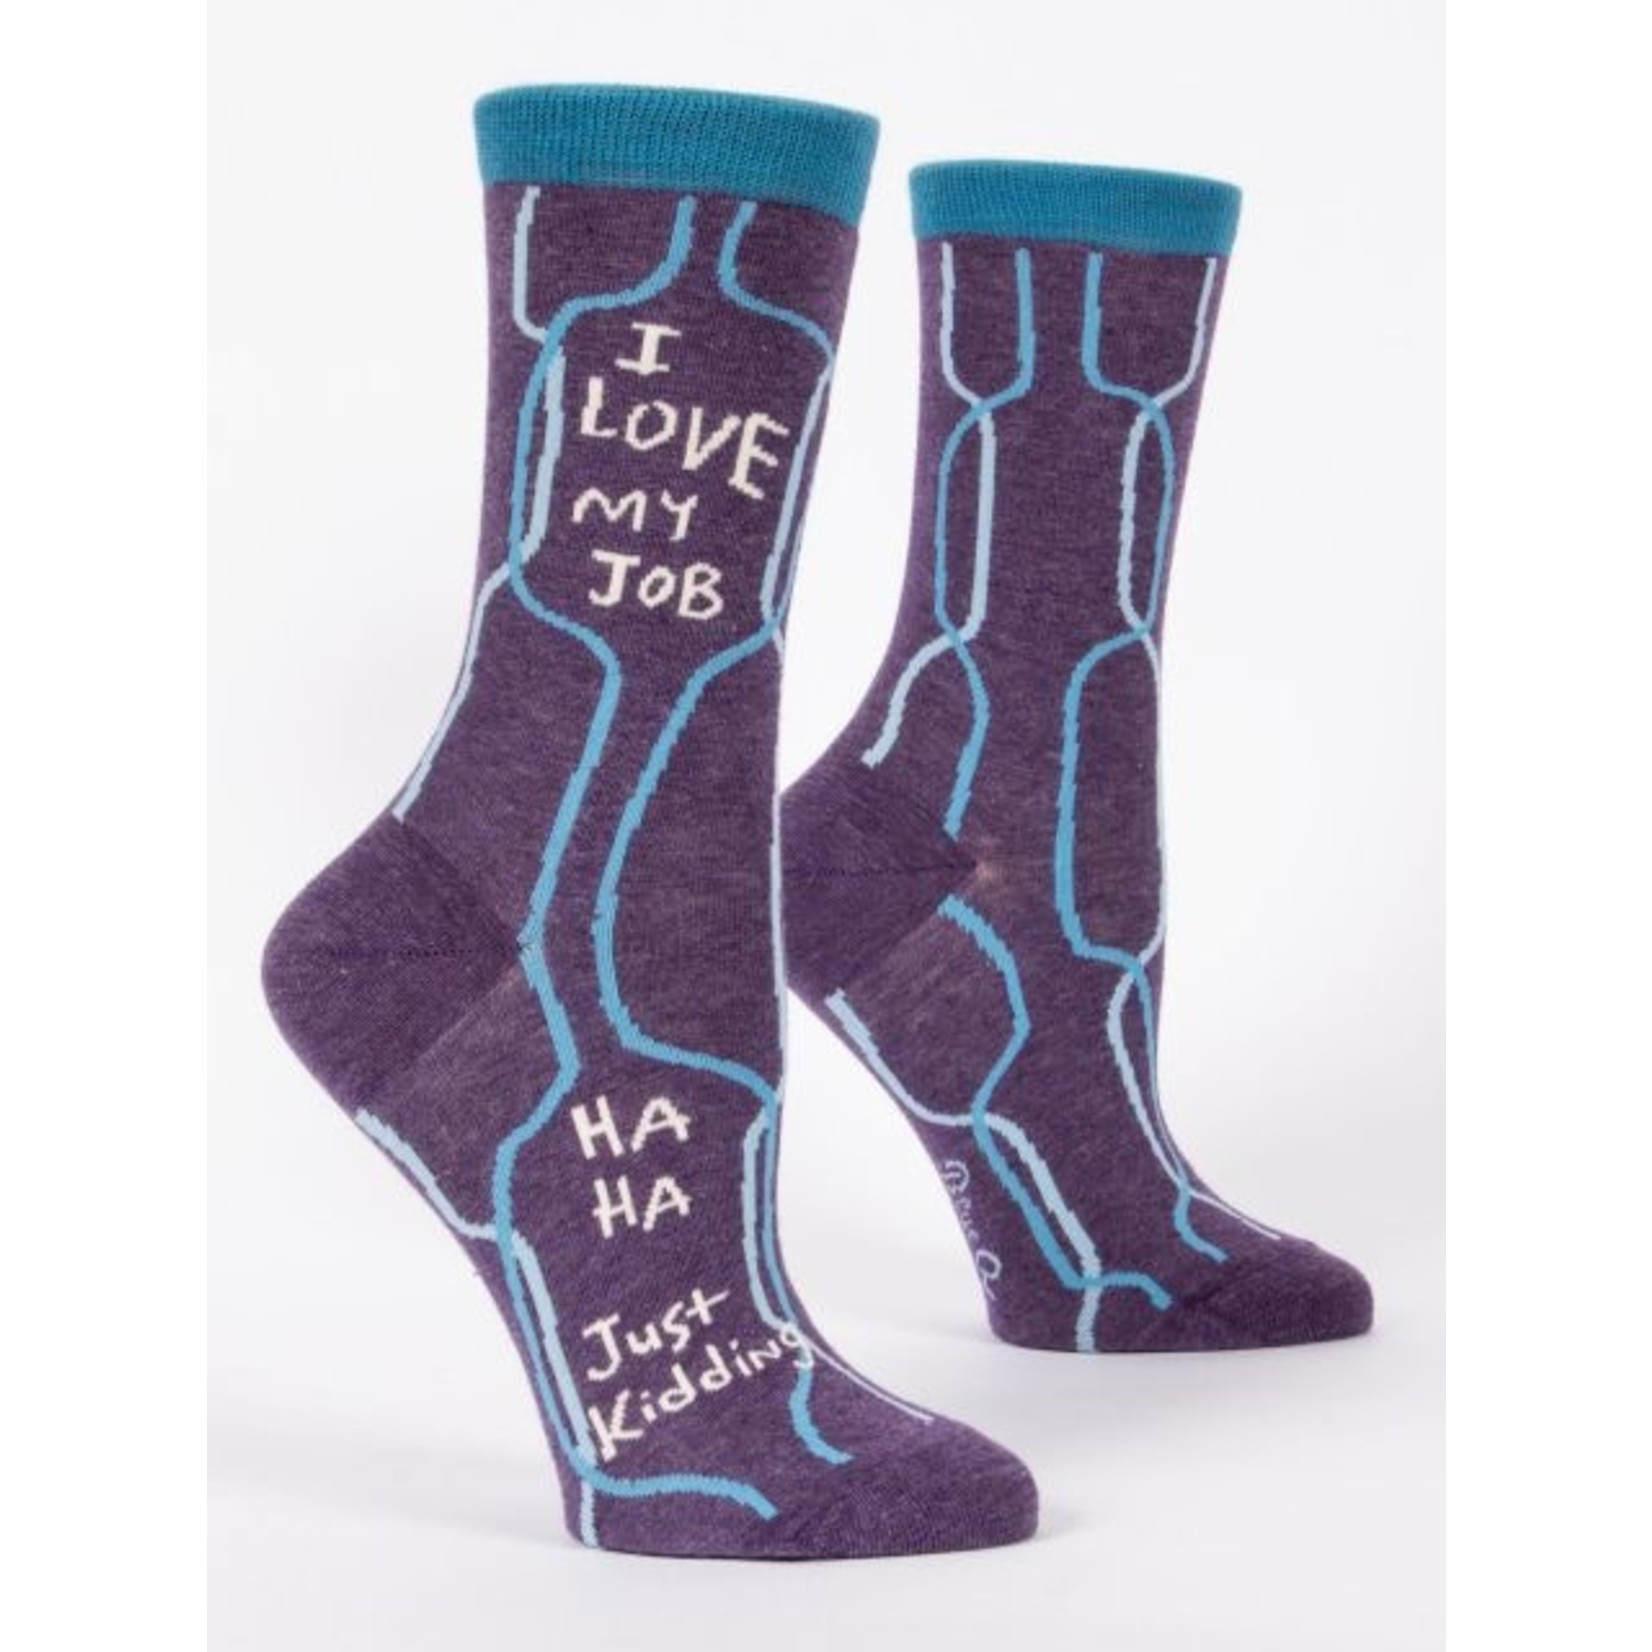 Socks (Womens) - I Love My Job